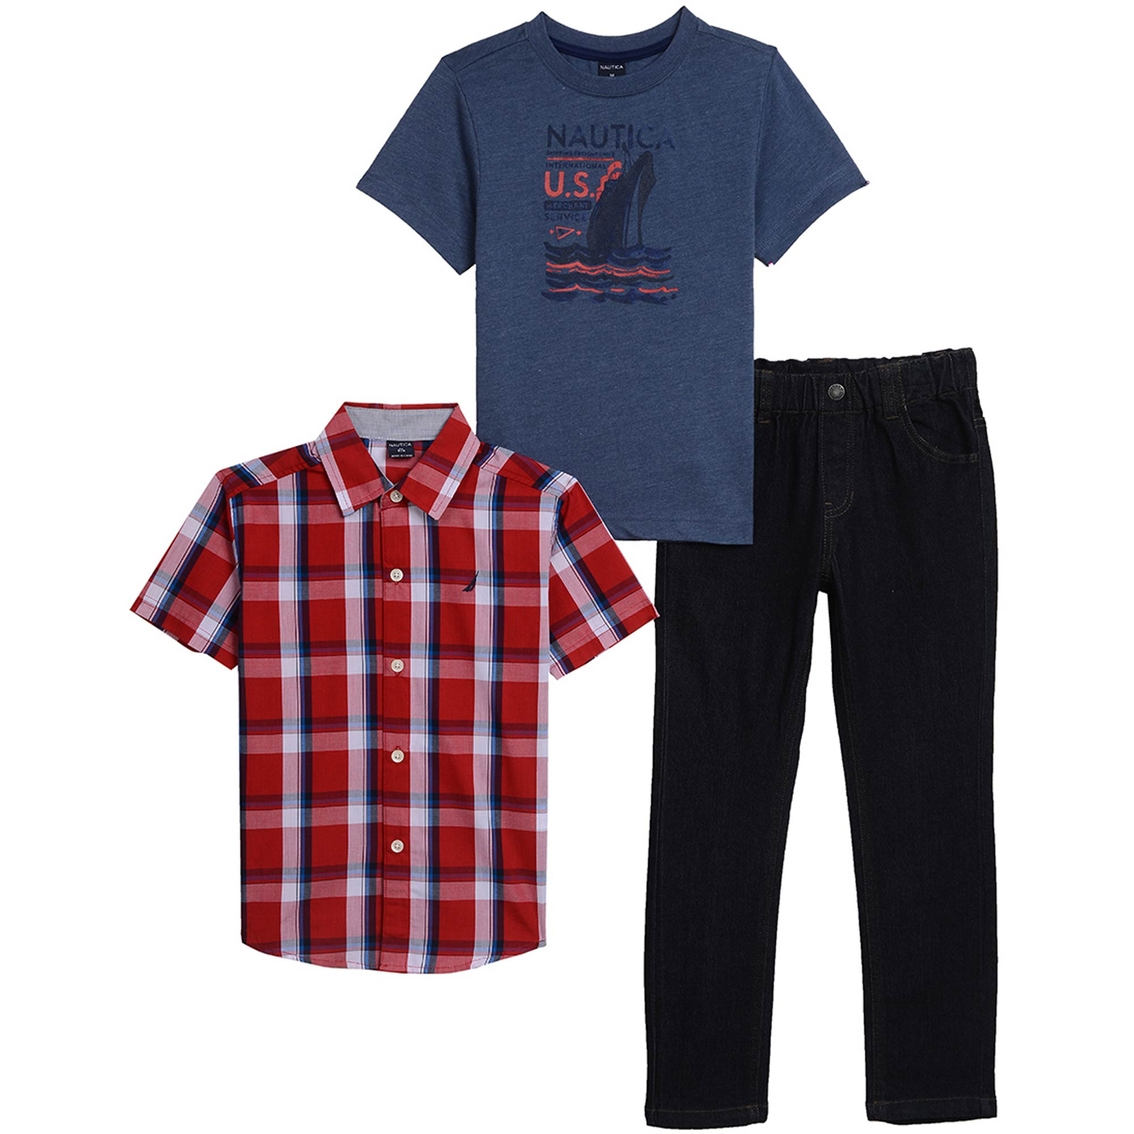 2ad14b7b9 Nautica Little Boys 3 Pc. Woven Set   Boys 4-7x   Apparel   Shop The ...